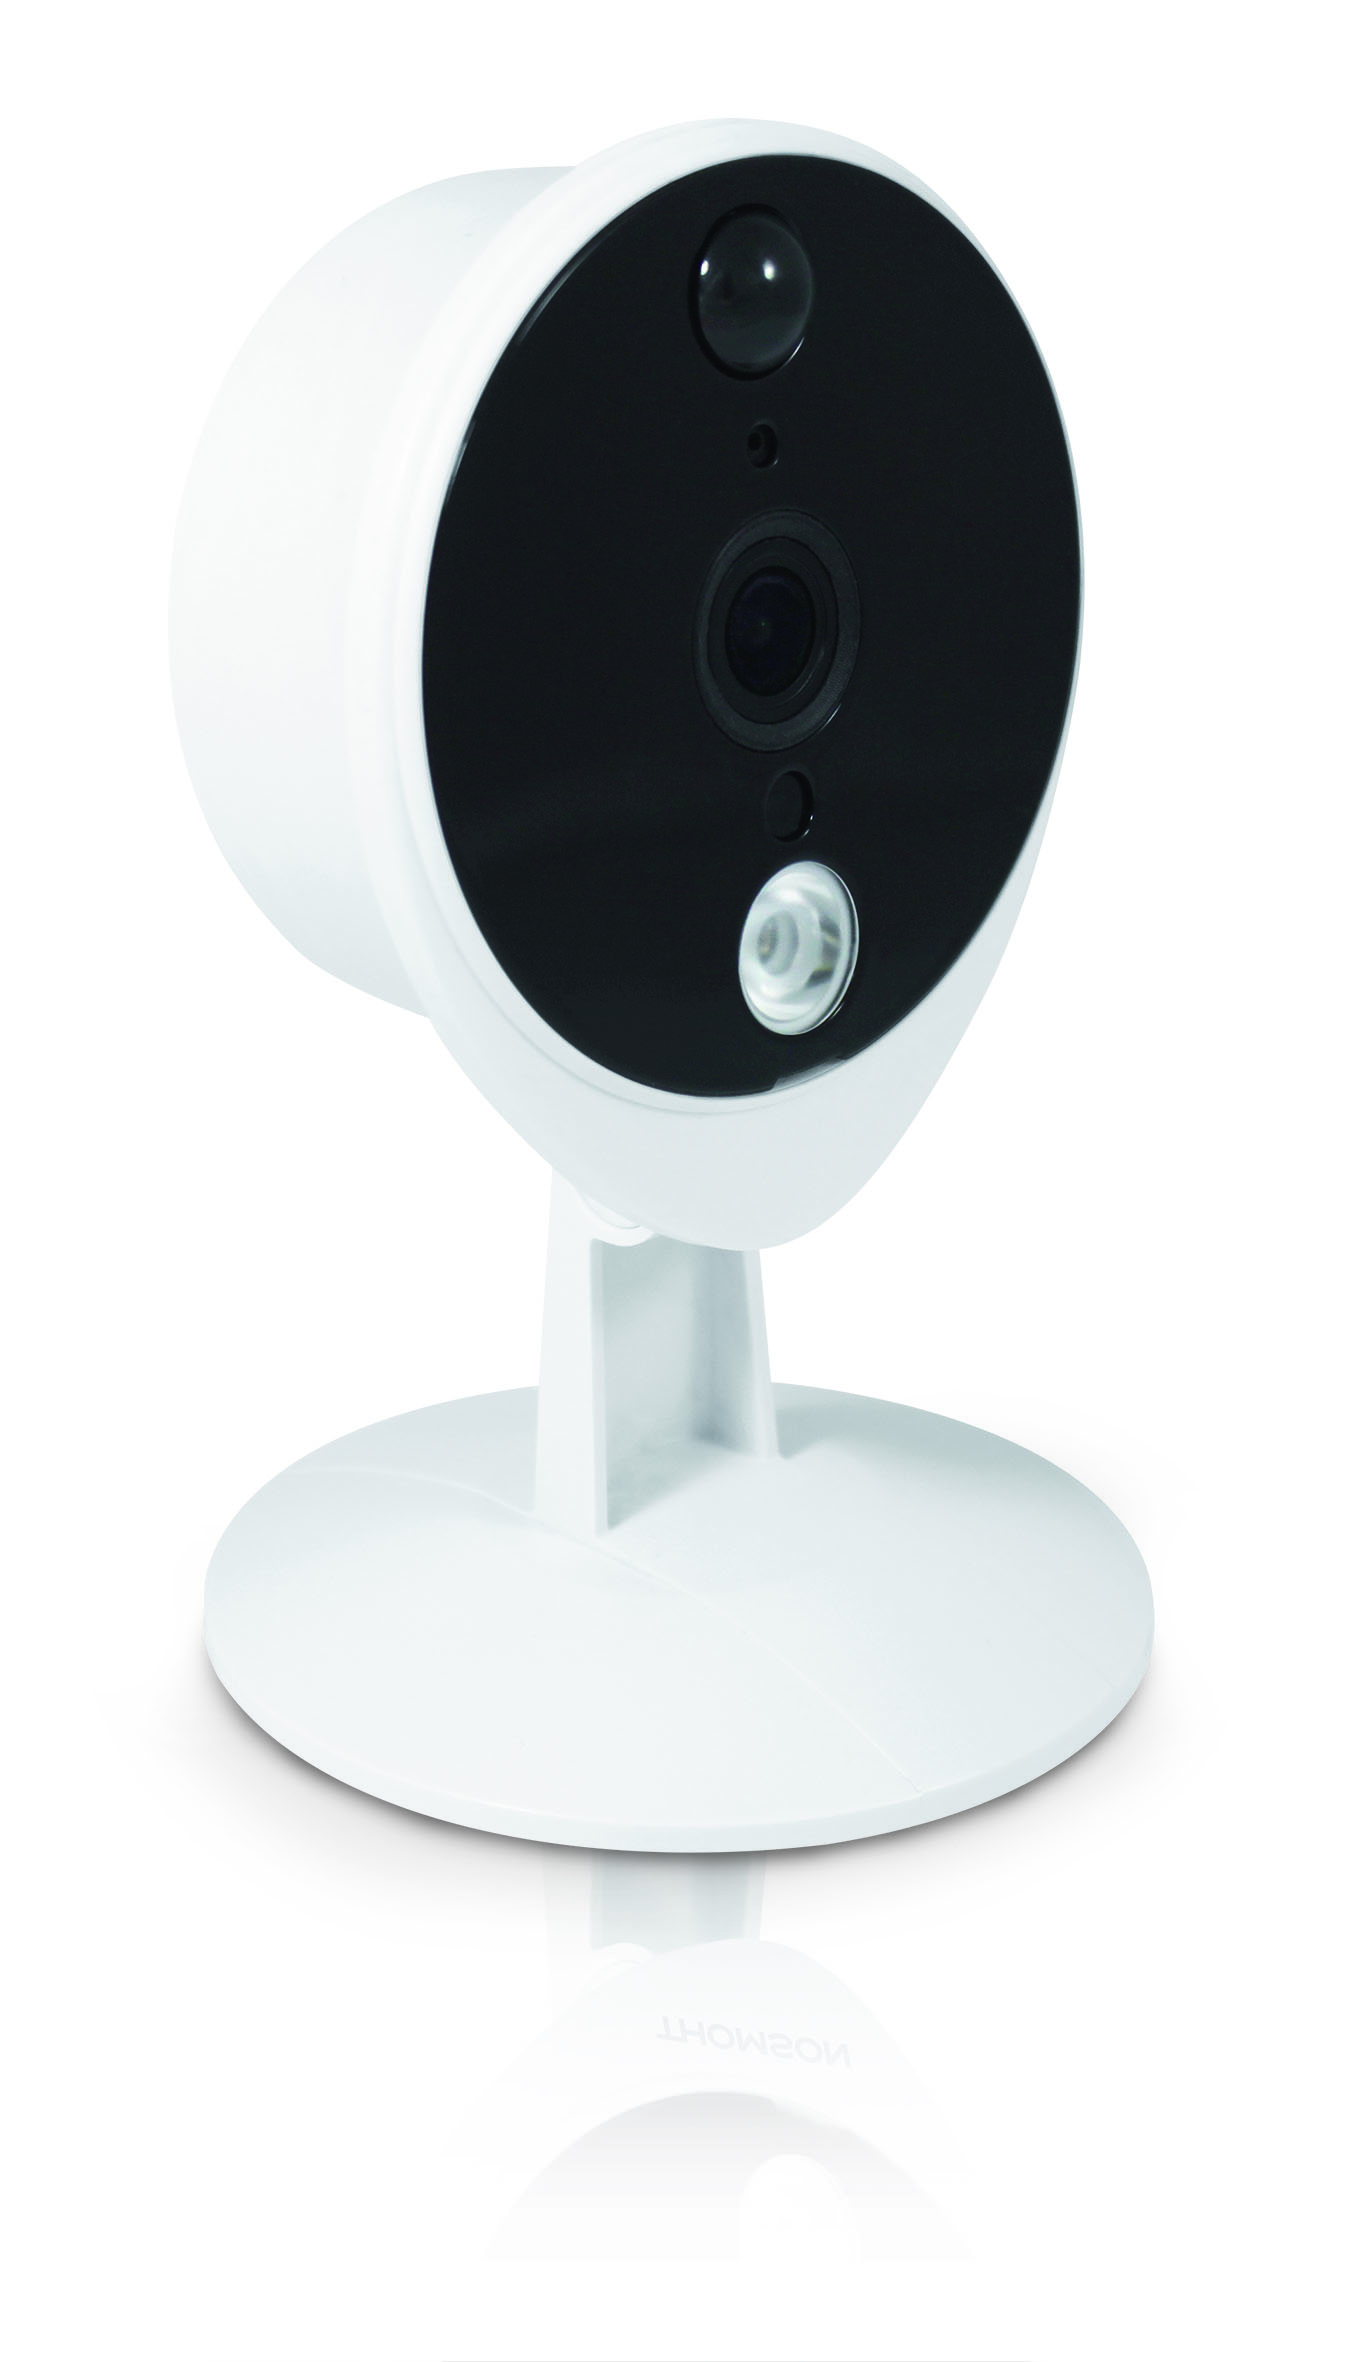 cam ra ip wifi 1080p couleur hd usage int rieur s curit maisonic. Black Bedroom Furniture Sets. Home Design Ideas